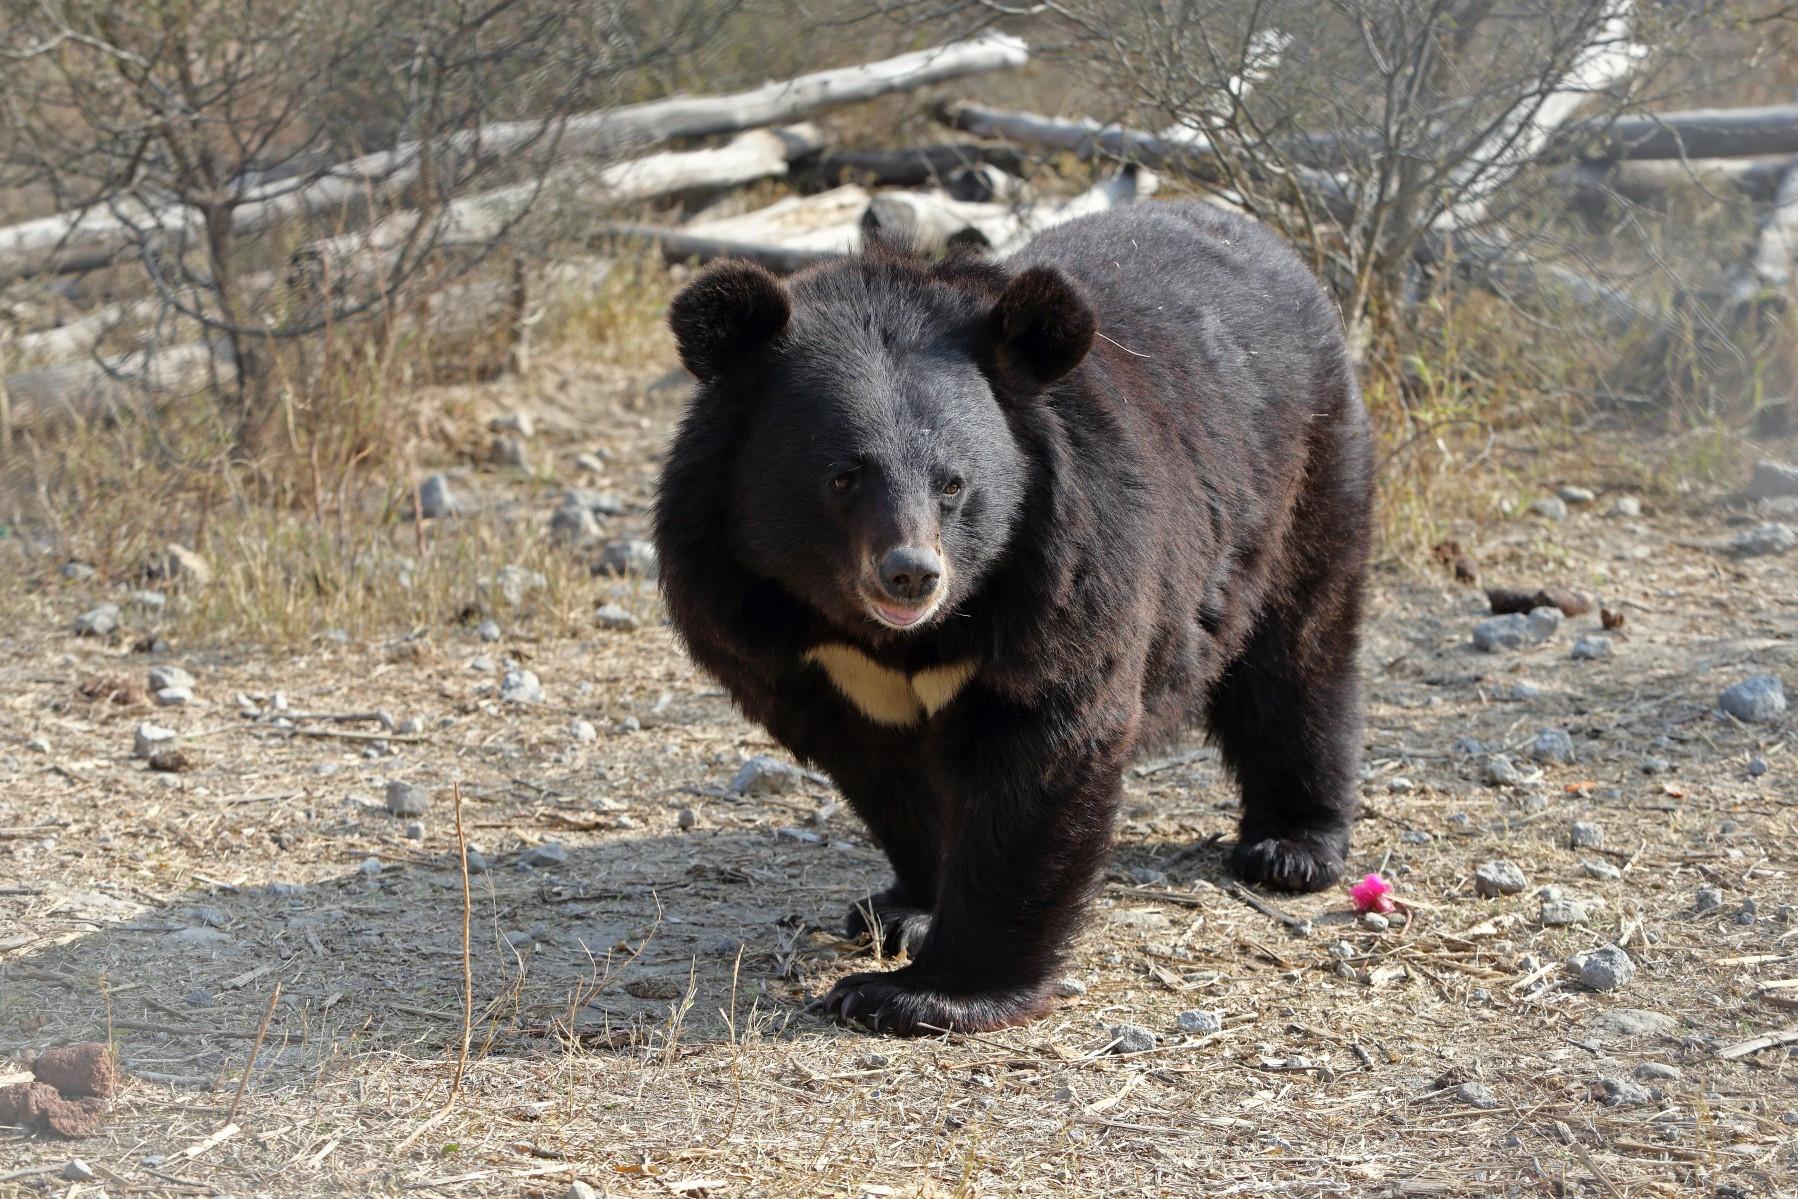 A bear at the Balkasar Bear Sanctuary in Pakistan